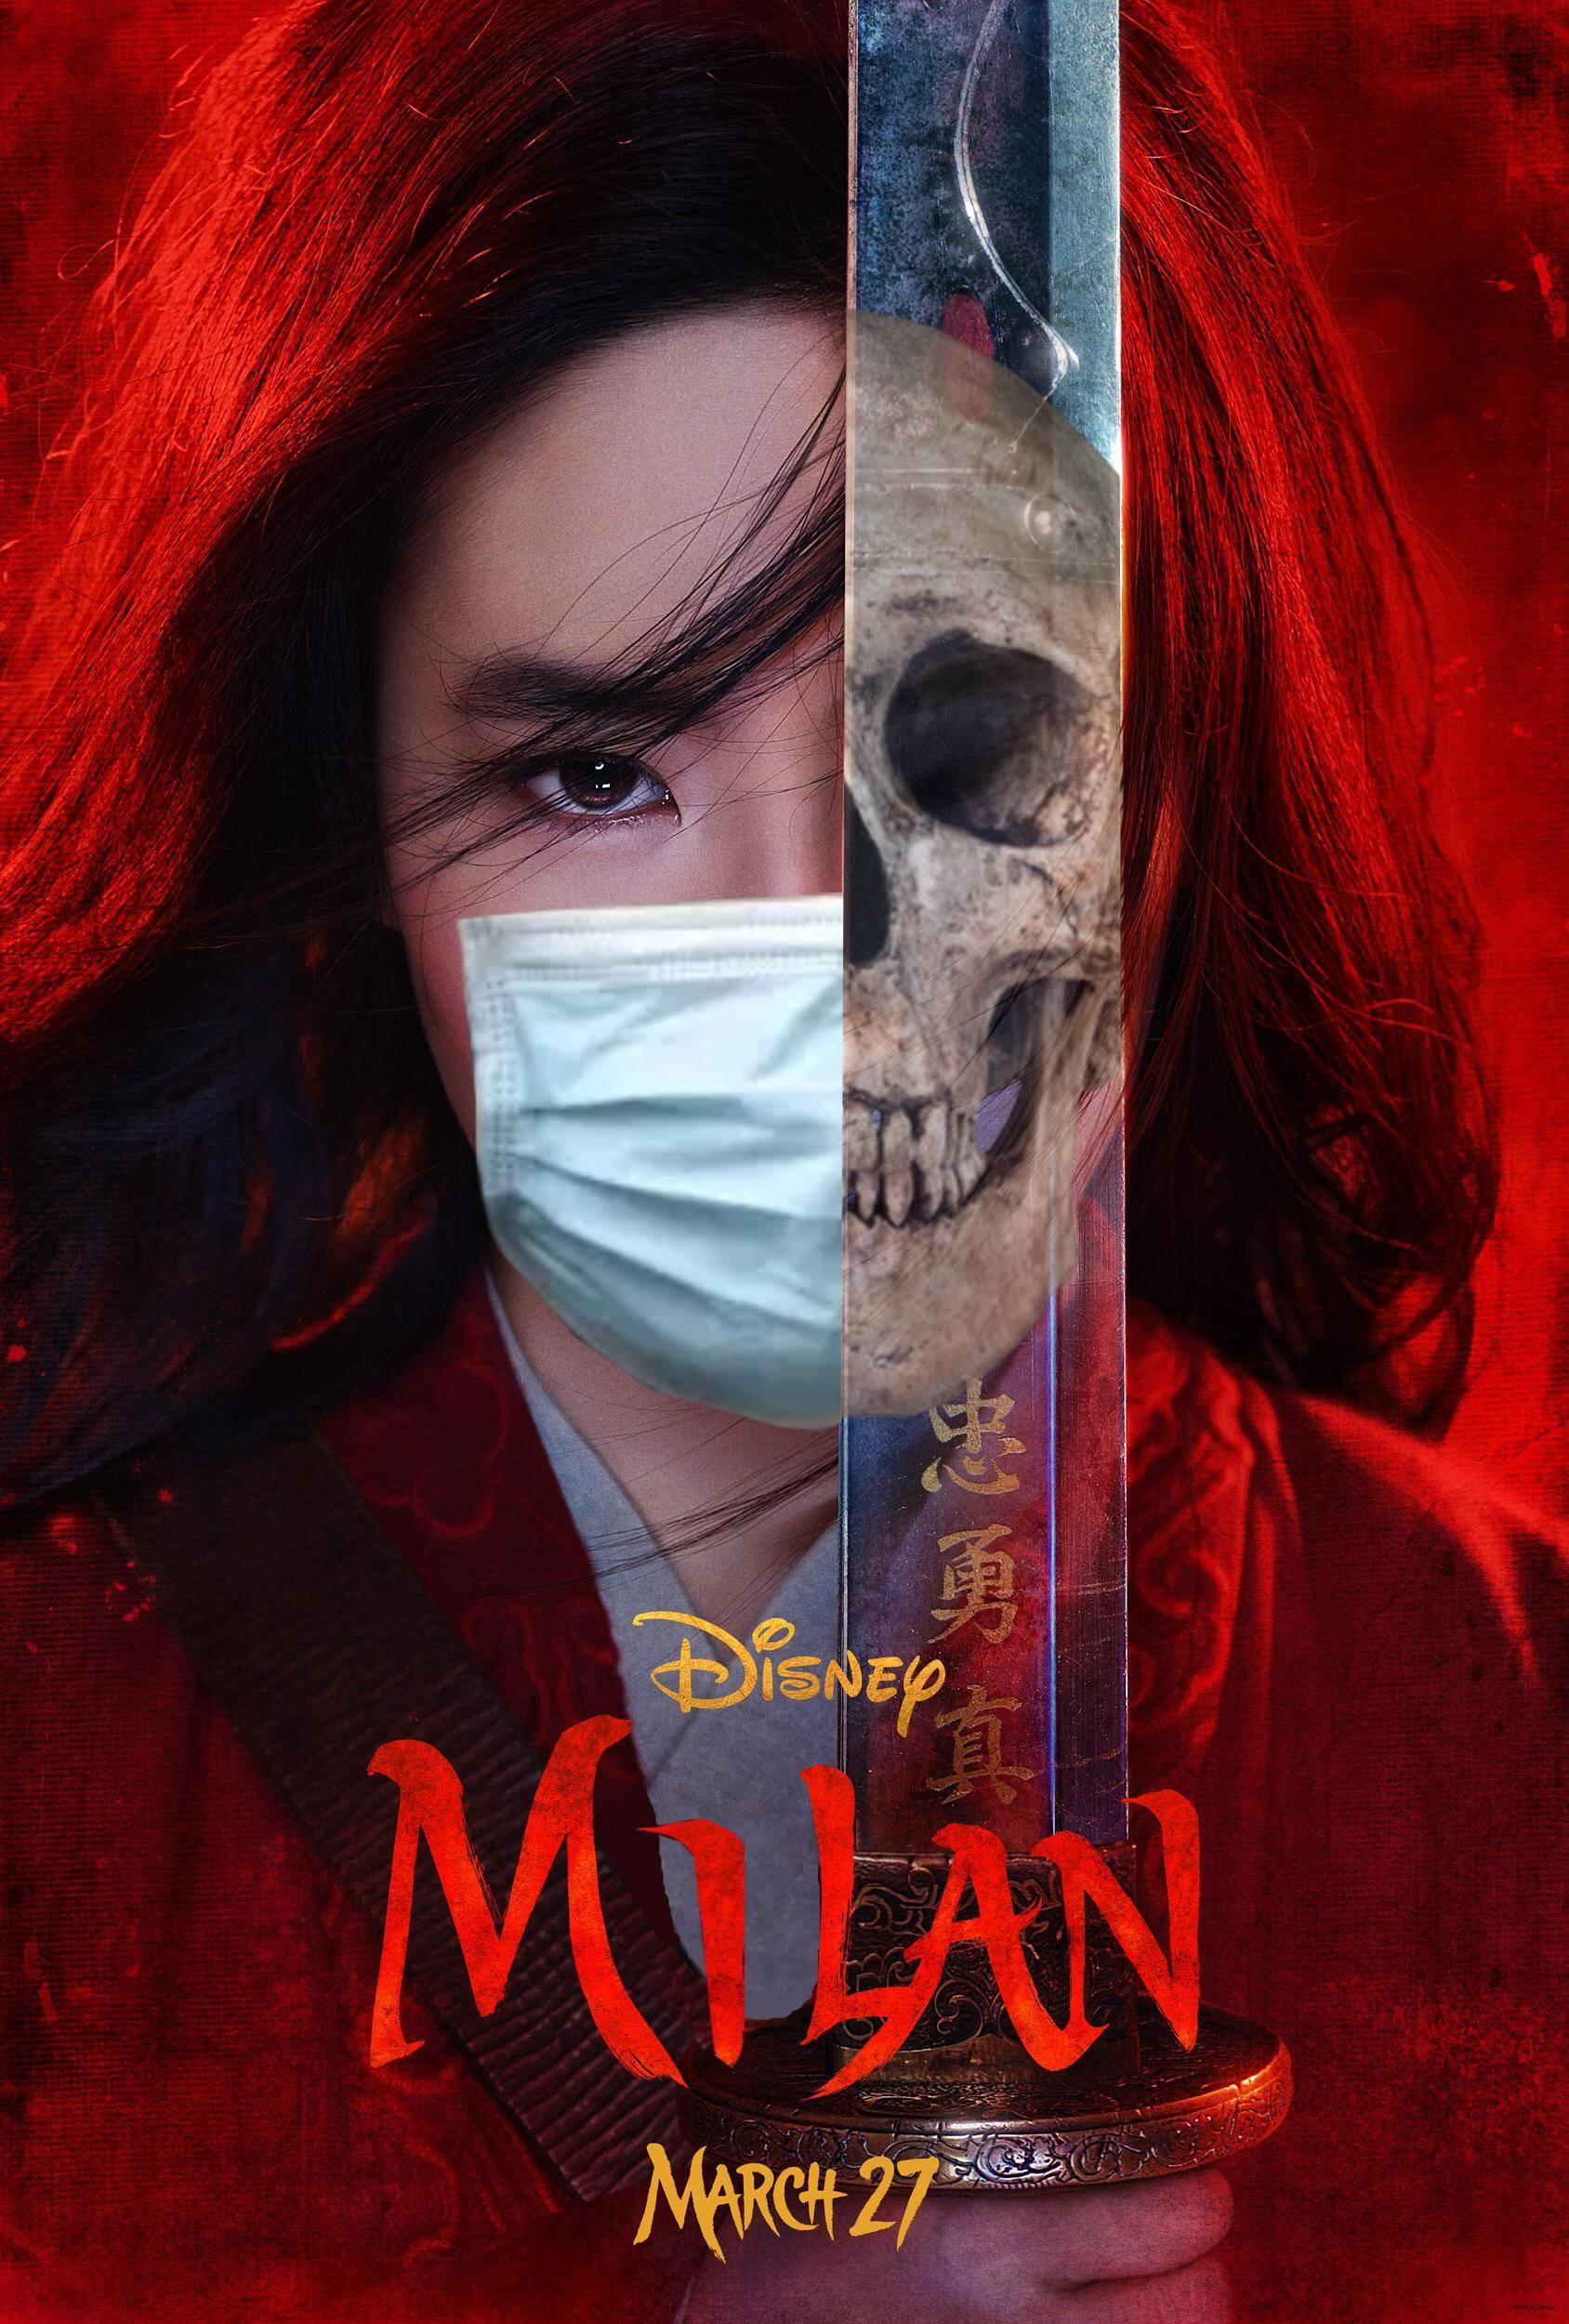 Mulan has Coronavirus   /r/Sbubby